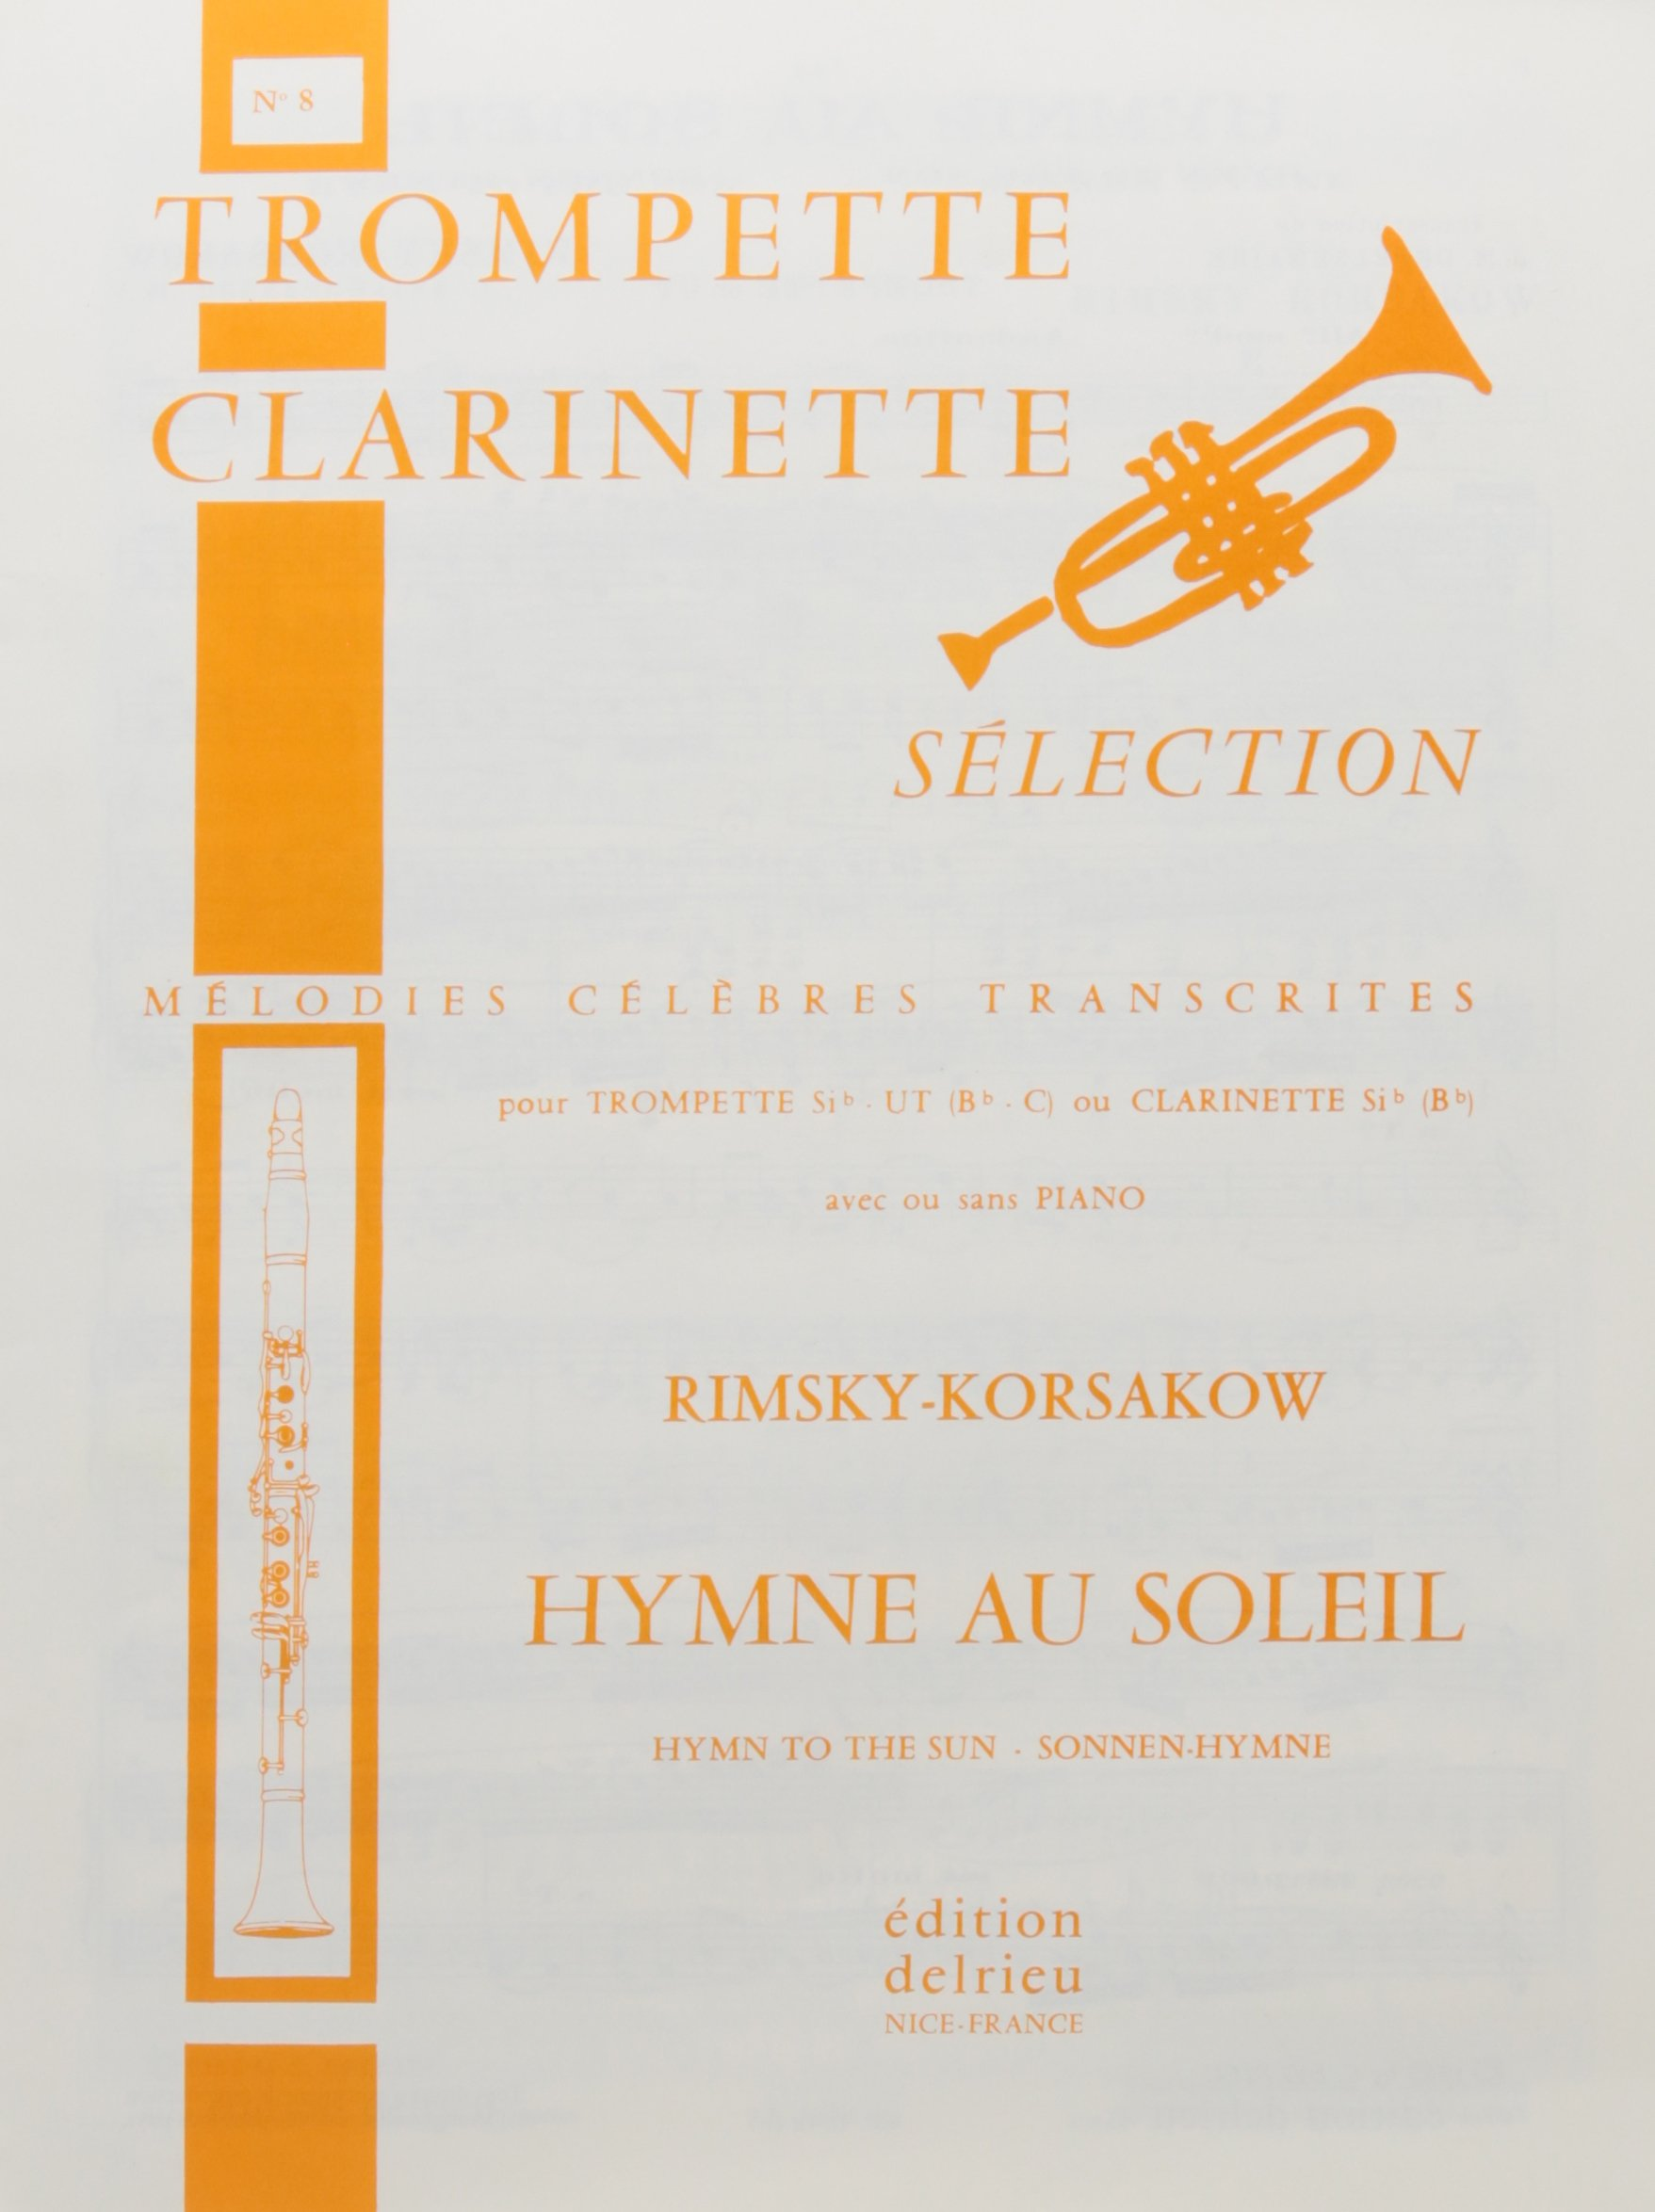 L'hymne au soleil Partition – 1 octobre 1970 Nicolaï Rimsky-Korsakov L' hymne au soleil Delrieu B001J2ZG4S